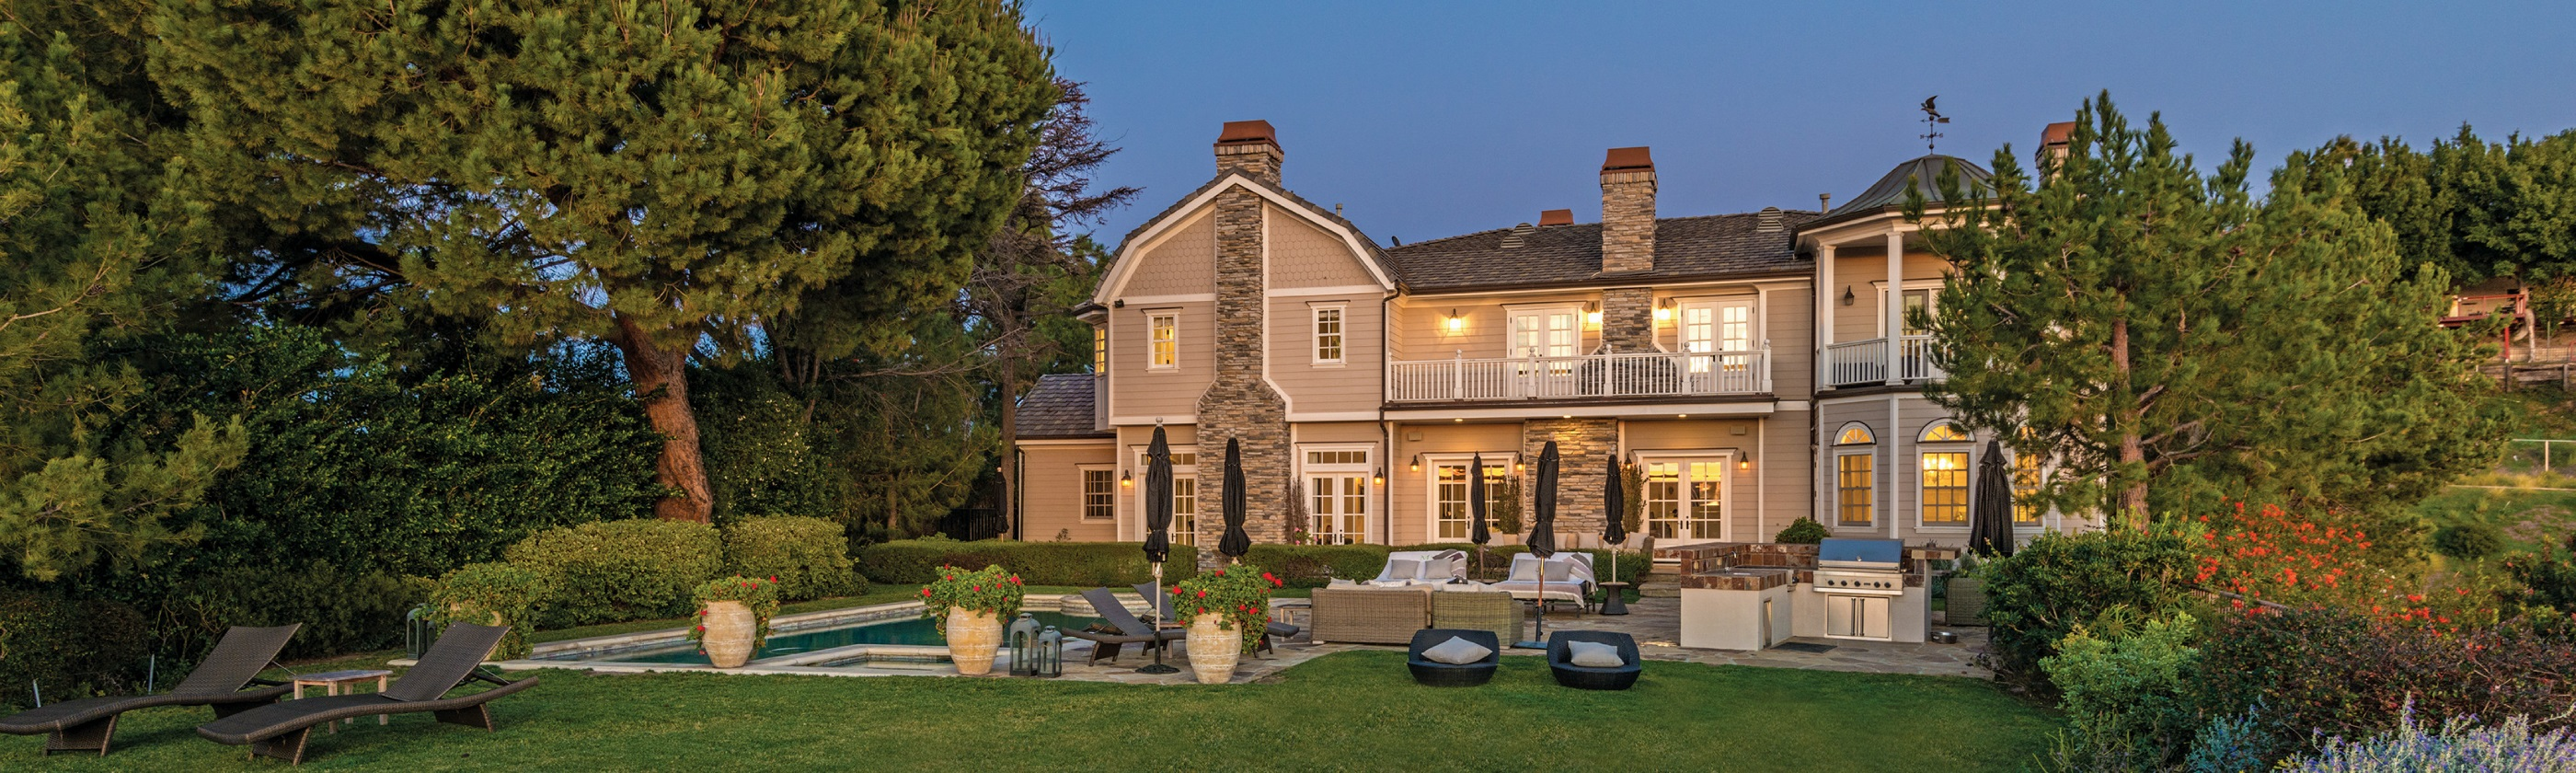 Luxury Estate Backyard